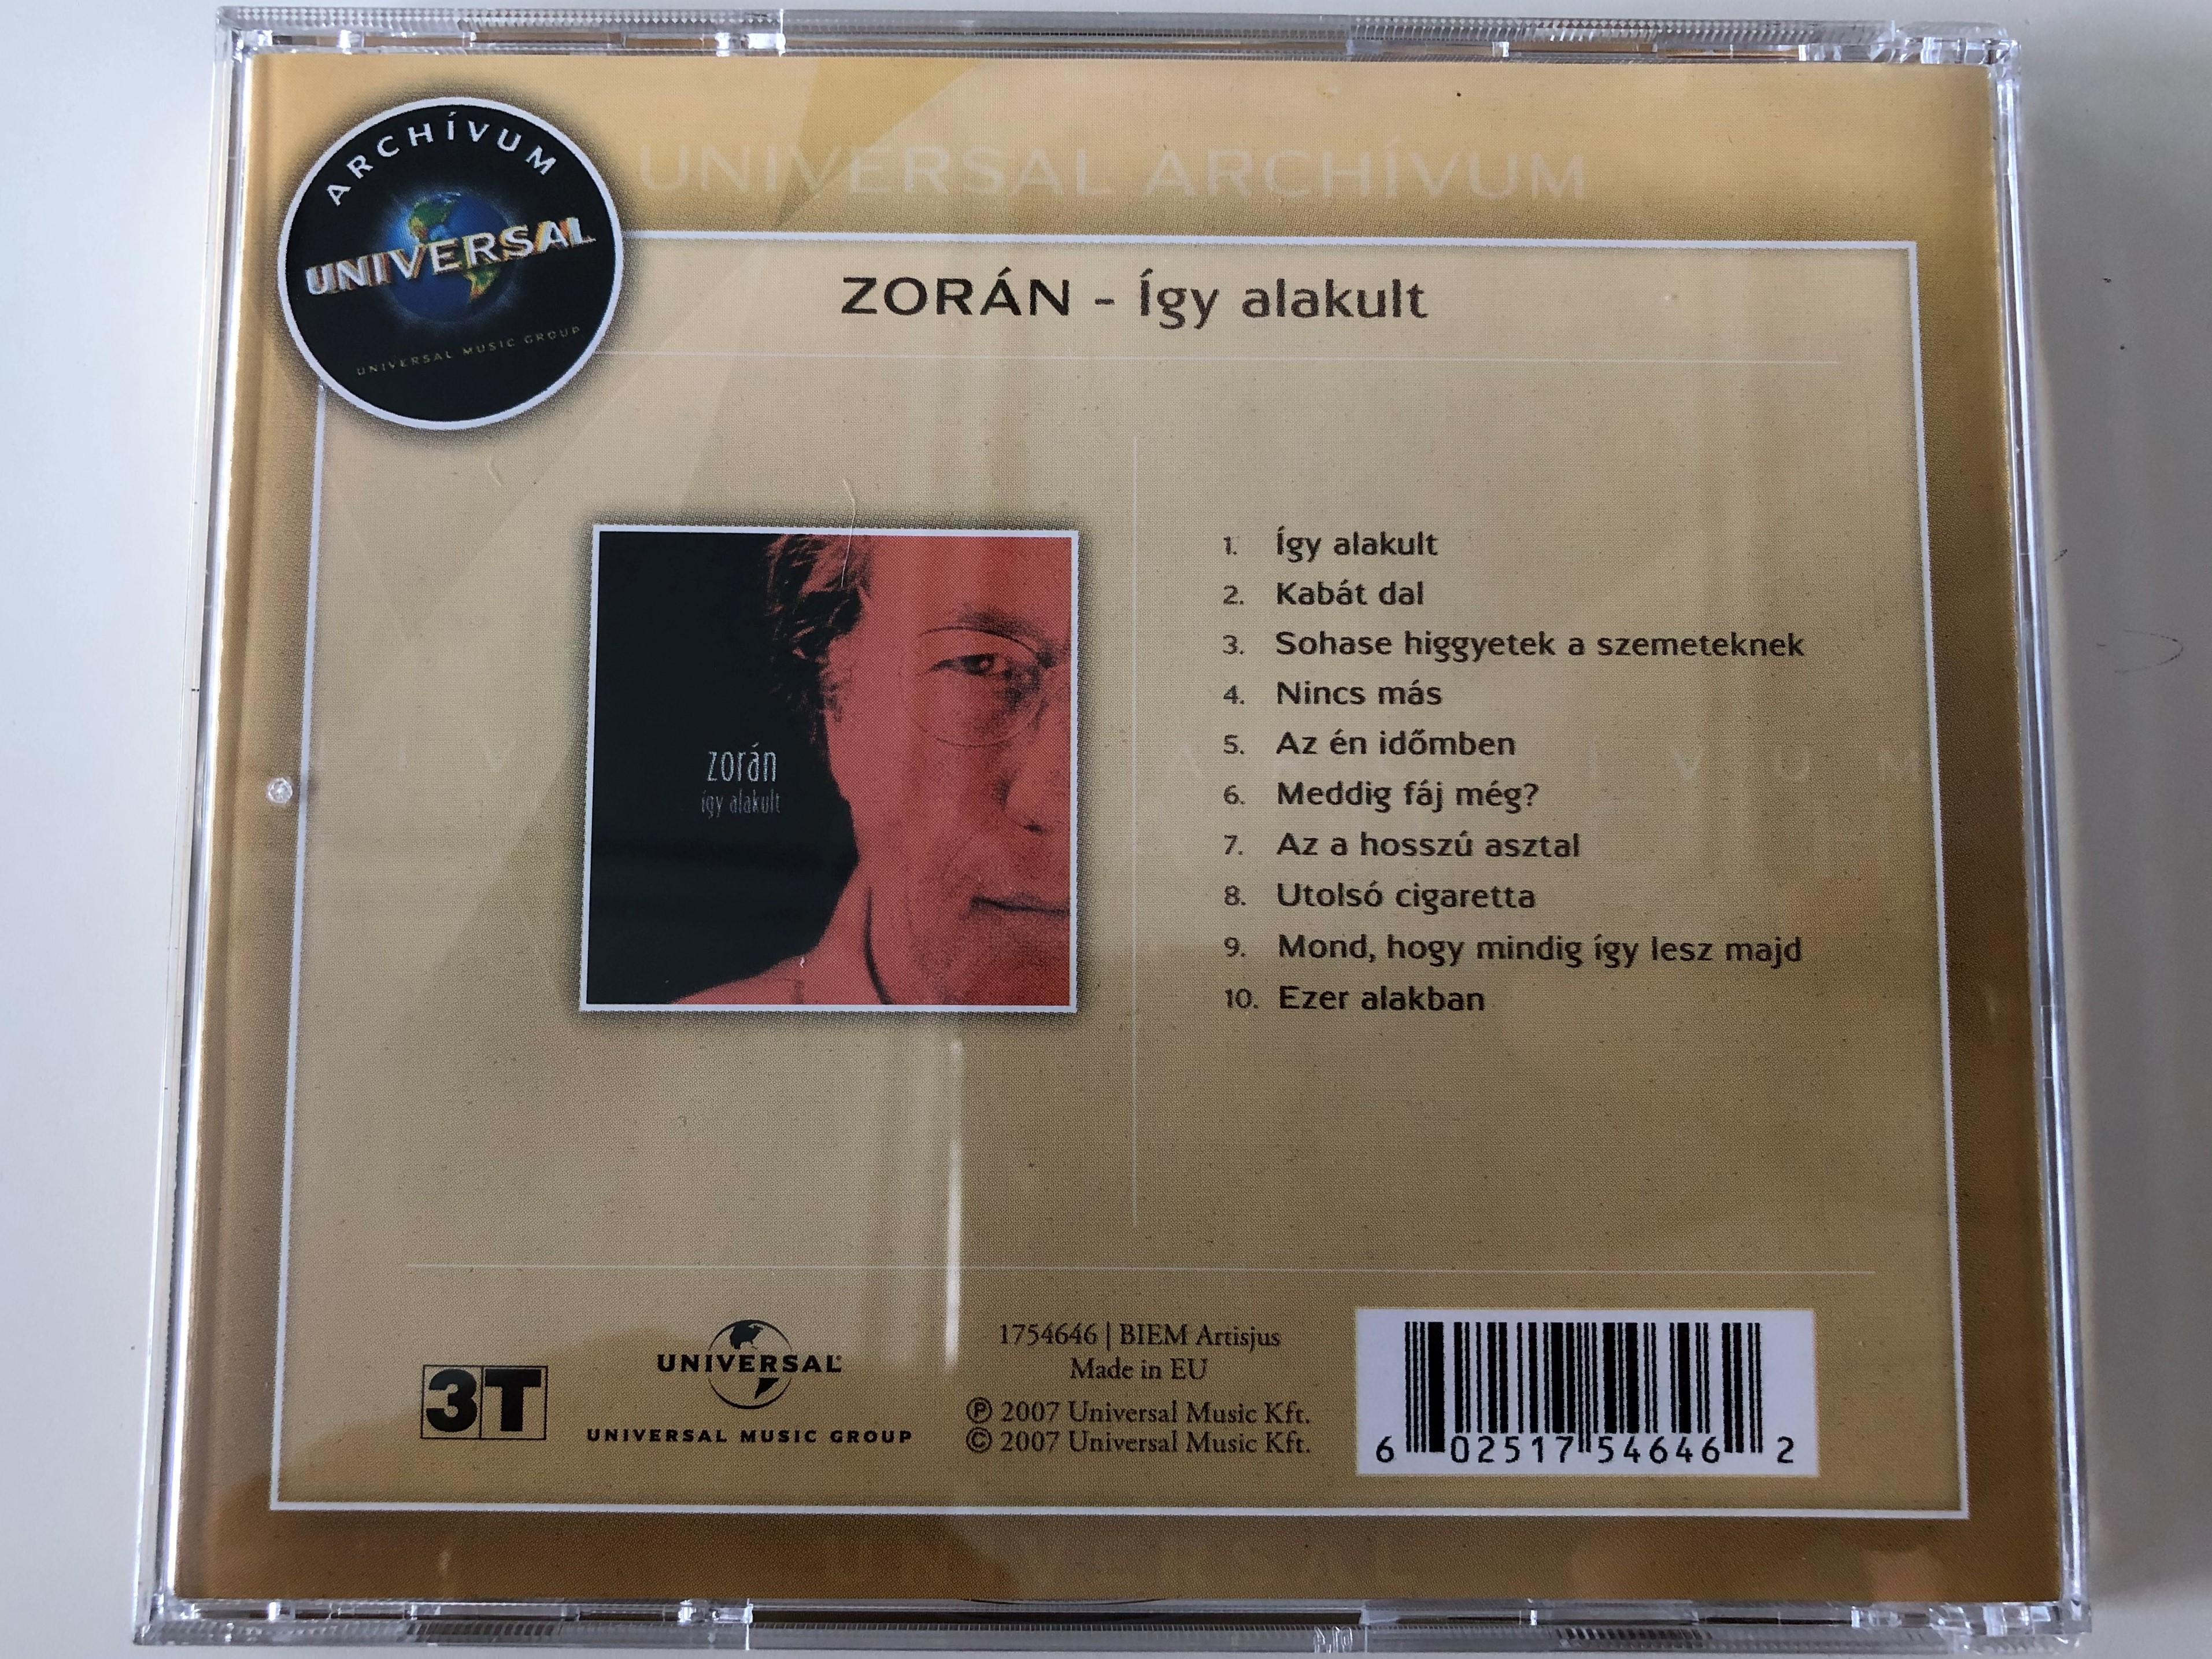 zor-n-gy-alakult-universal-music-kft.-audio-cd-2007-1754646-5-.jpg